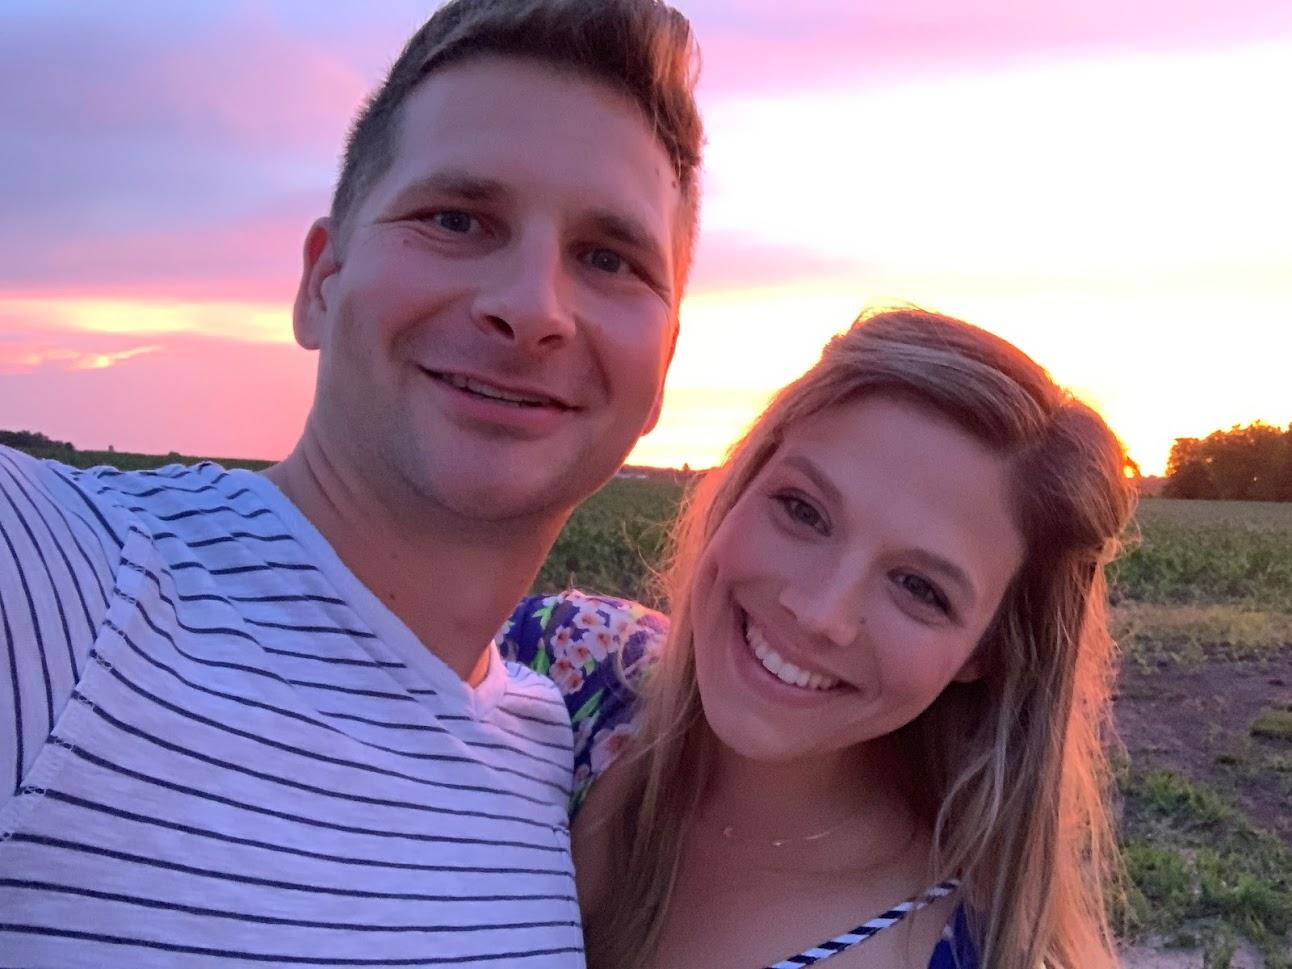 husband and wife sunset photo, stripe shirt